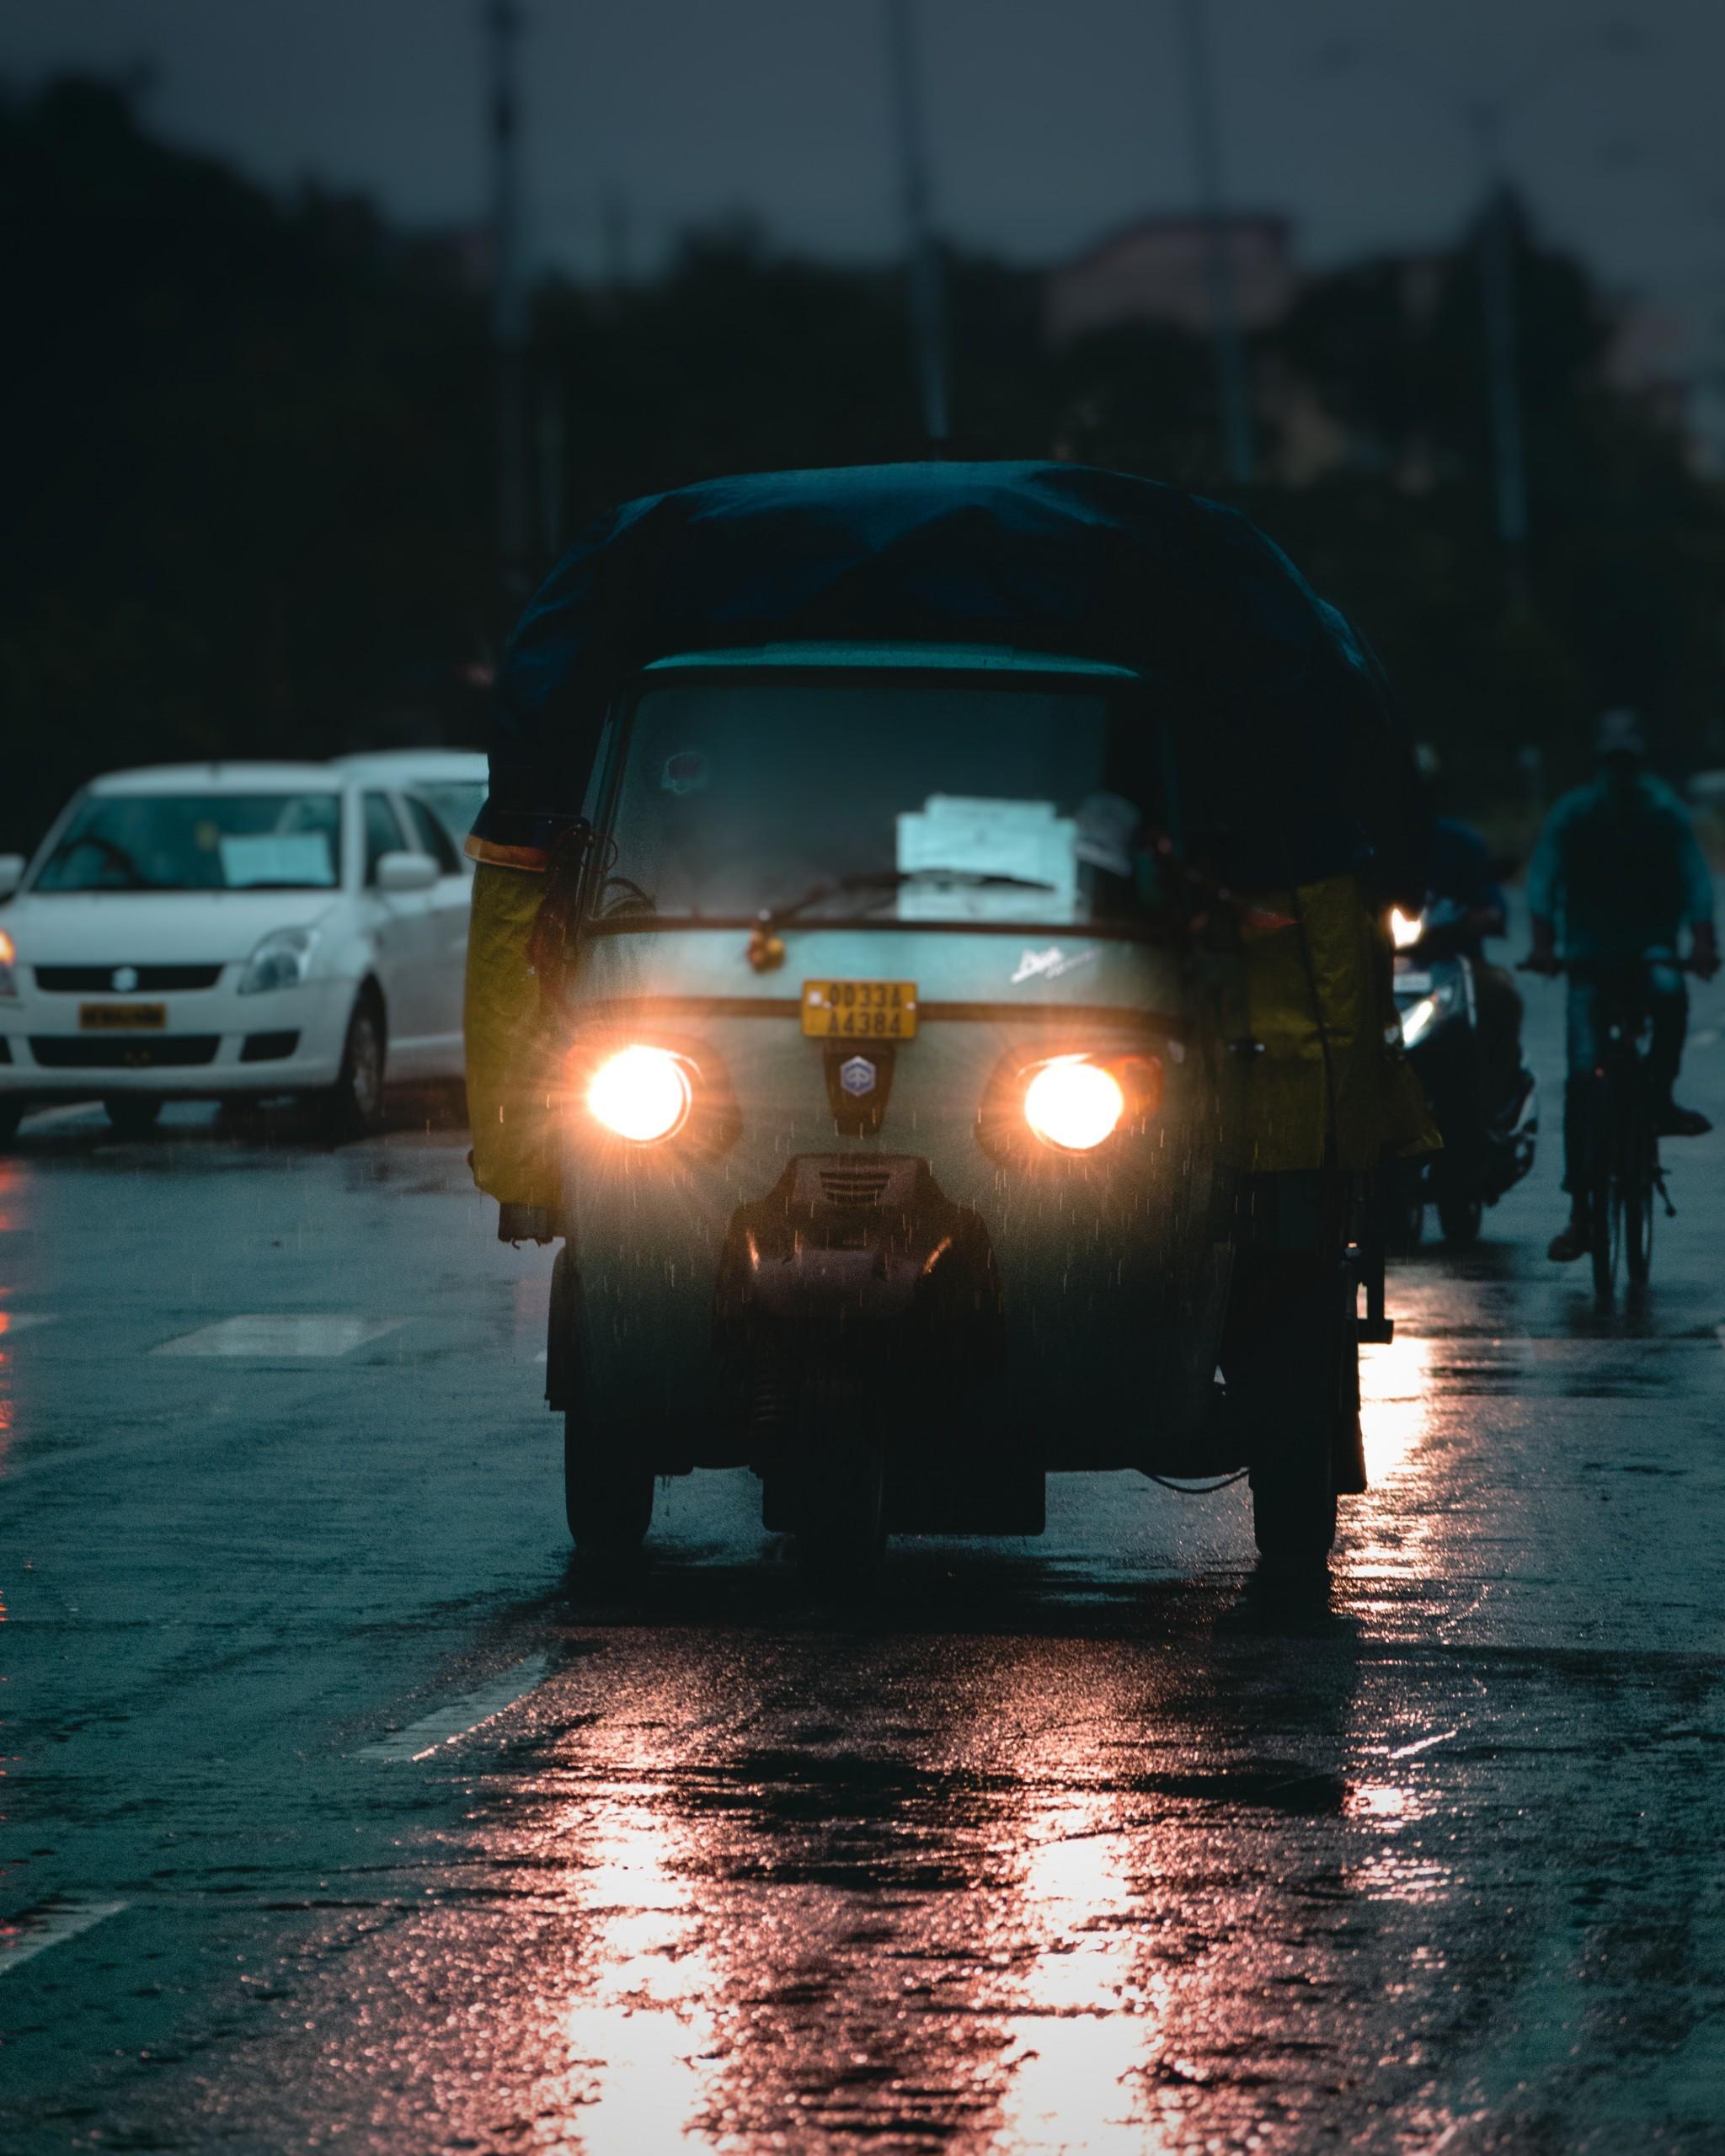 Rainy Day in BHubaneshwar